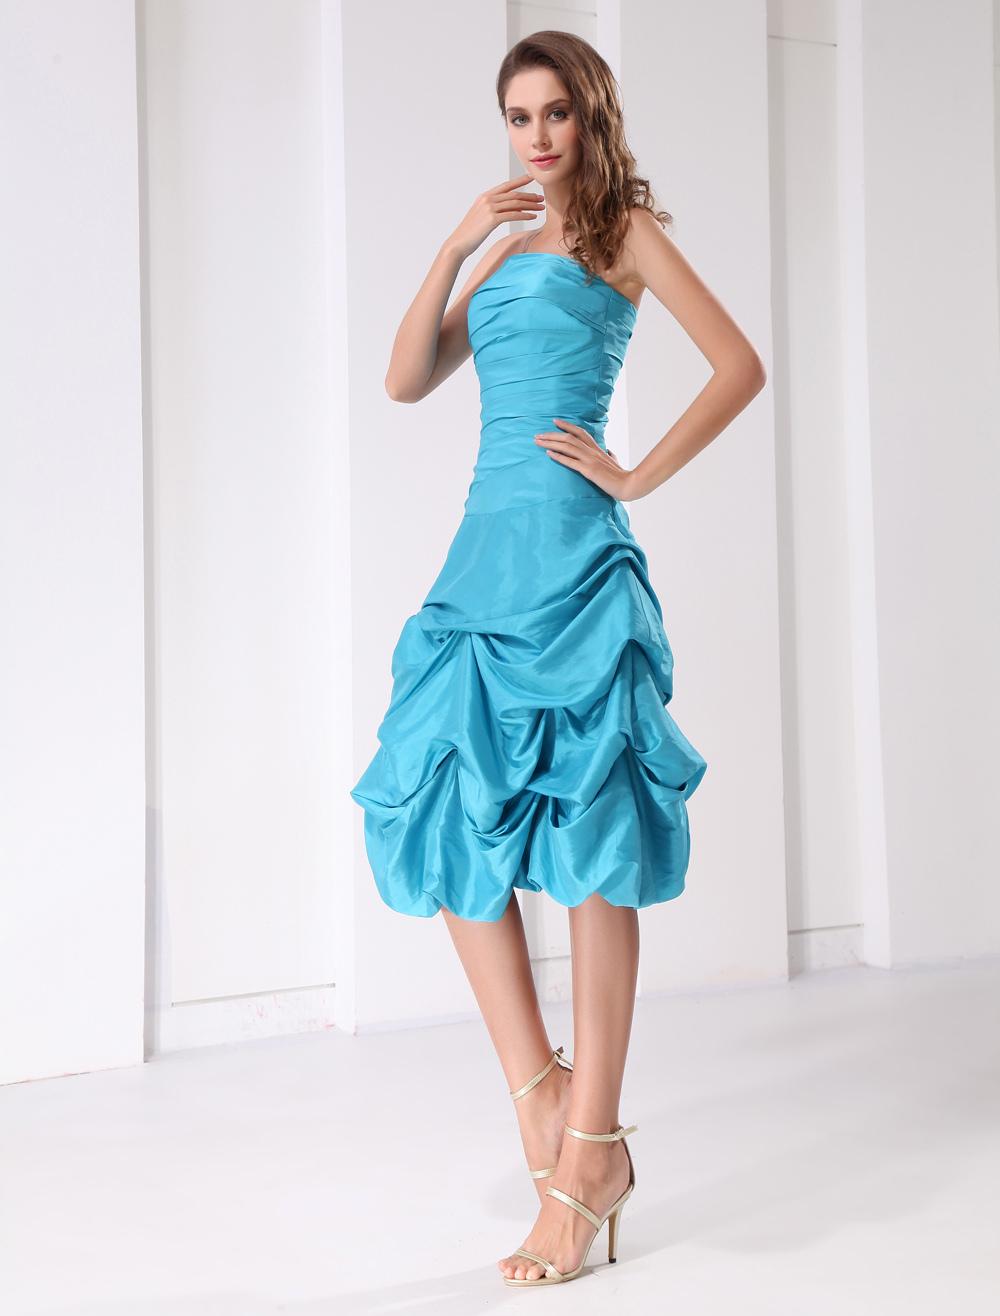 Short Prom Dress Aqua Strapless Ruched Ball Gown Knee Length Taffeta ...